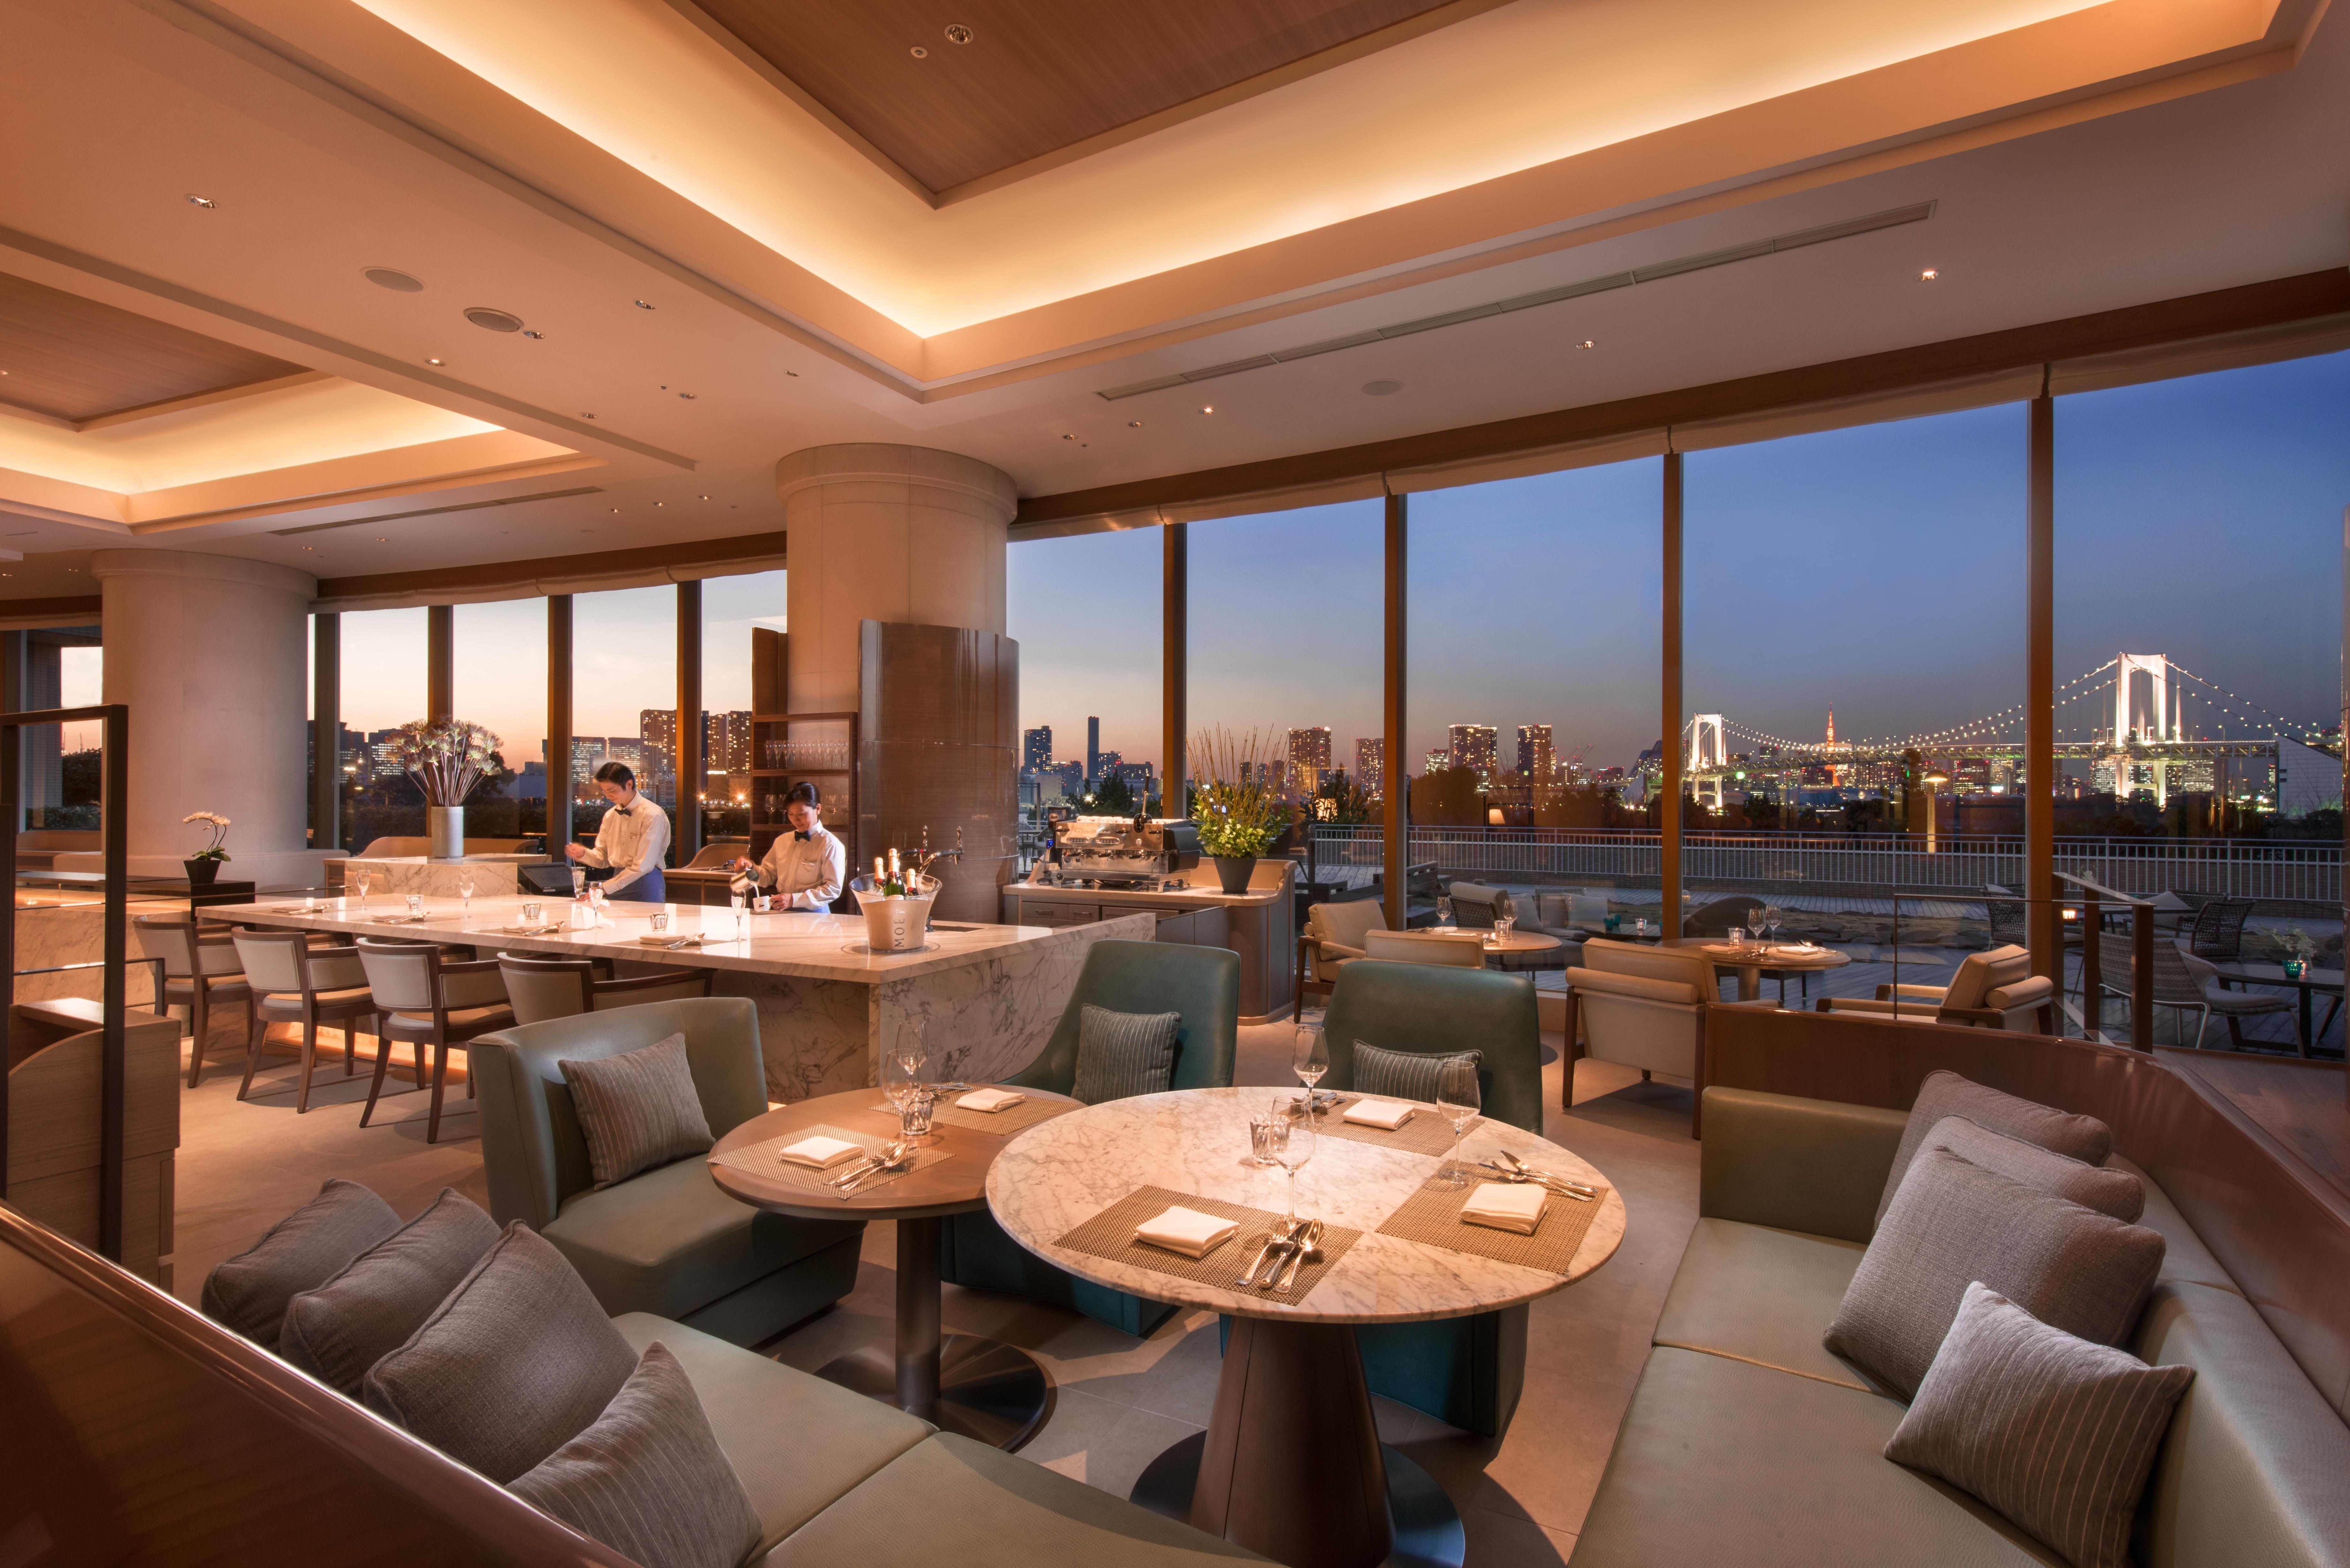 Best Hotel tokyo 2015 Lovely the 10 Best Restaurants Near Hilton tokyo Odaiba Tripadvisor